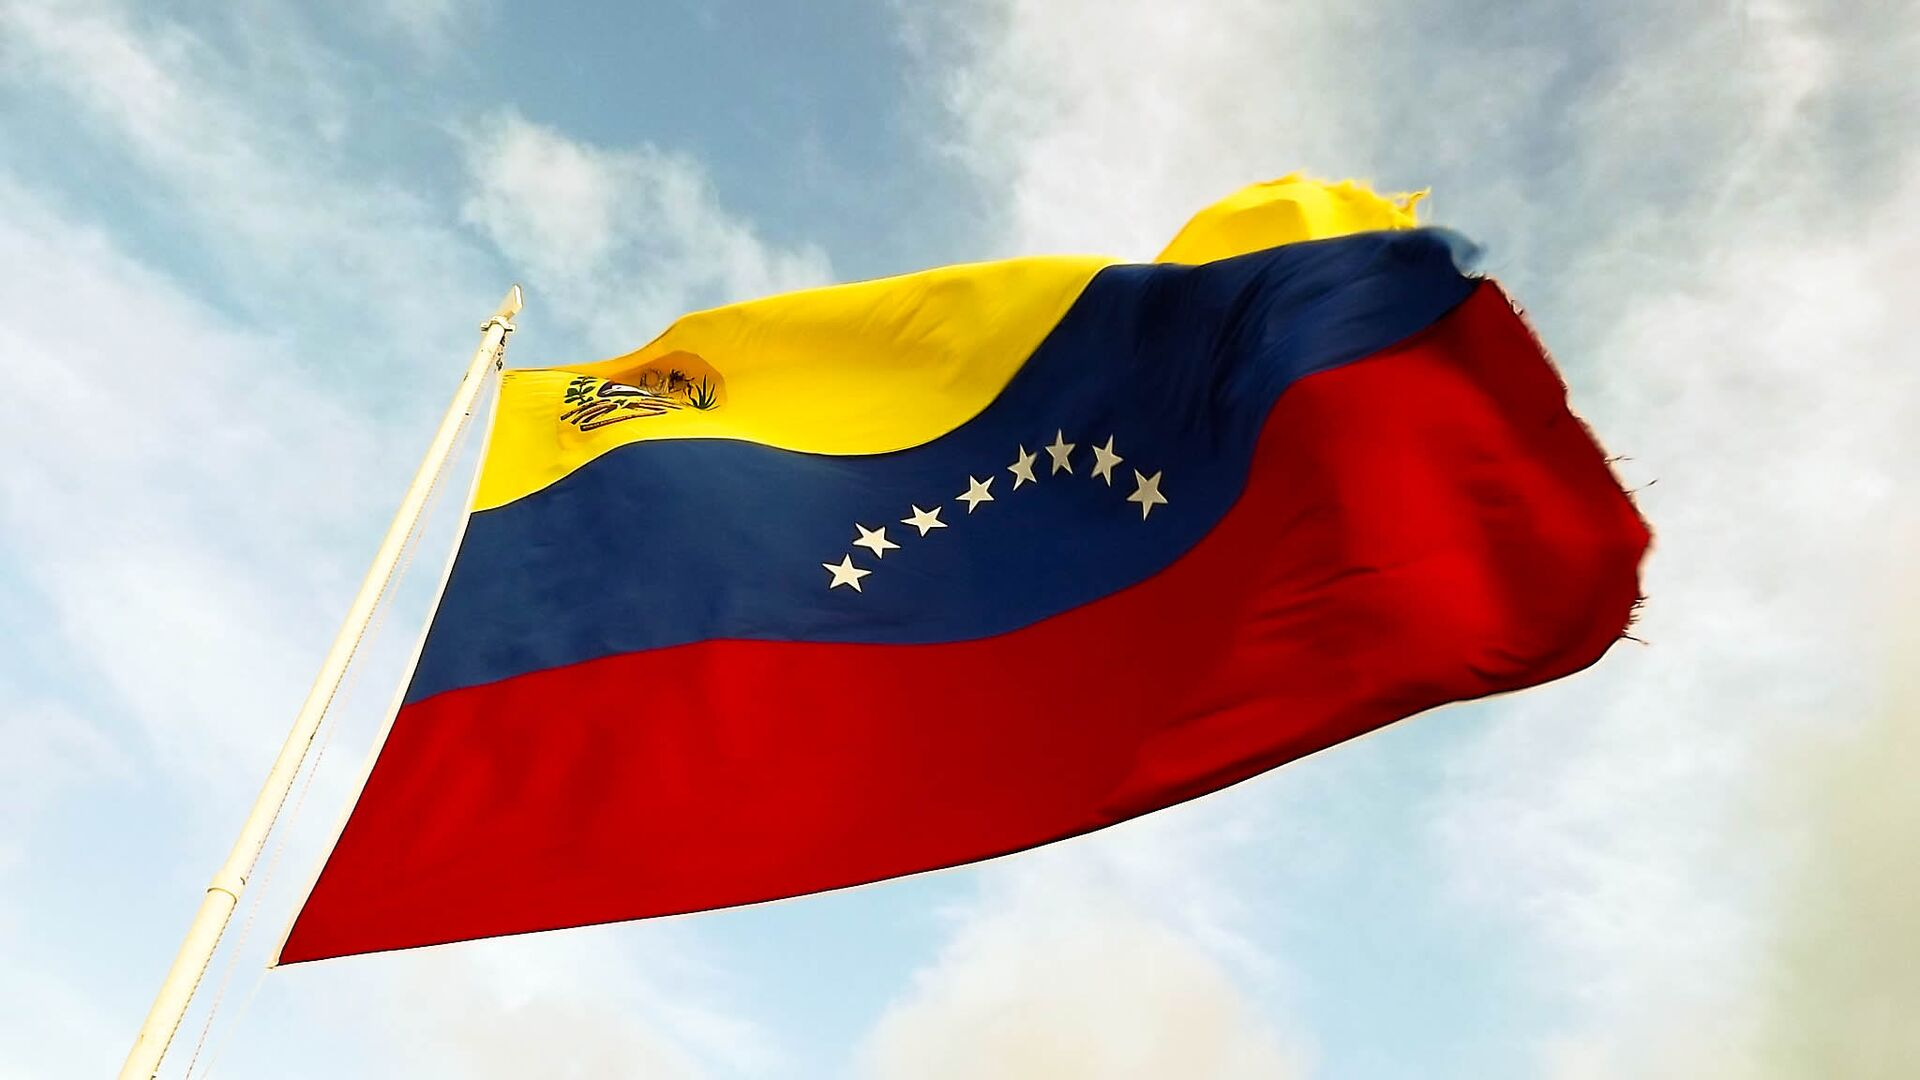 Bandera de Venezuela - Sputnik Mundo, 1920, 25.03.2021